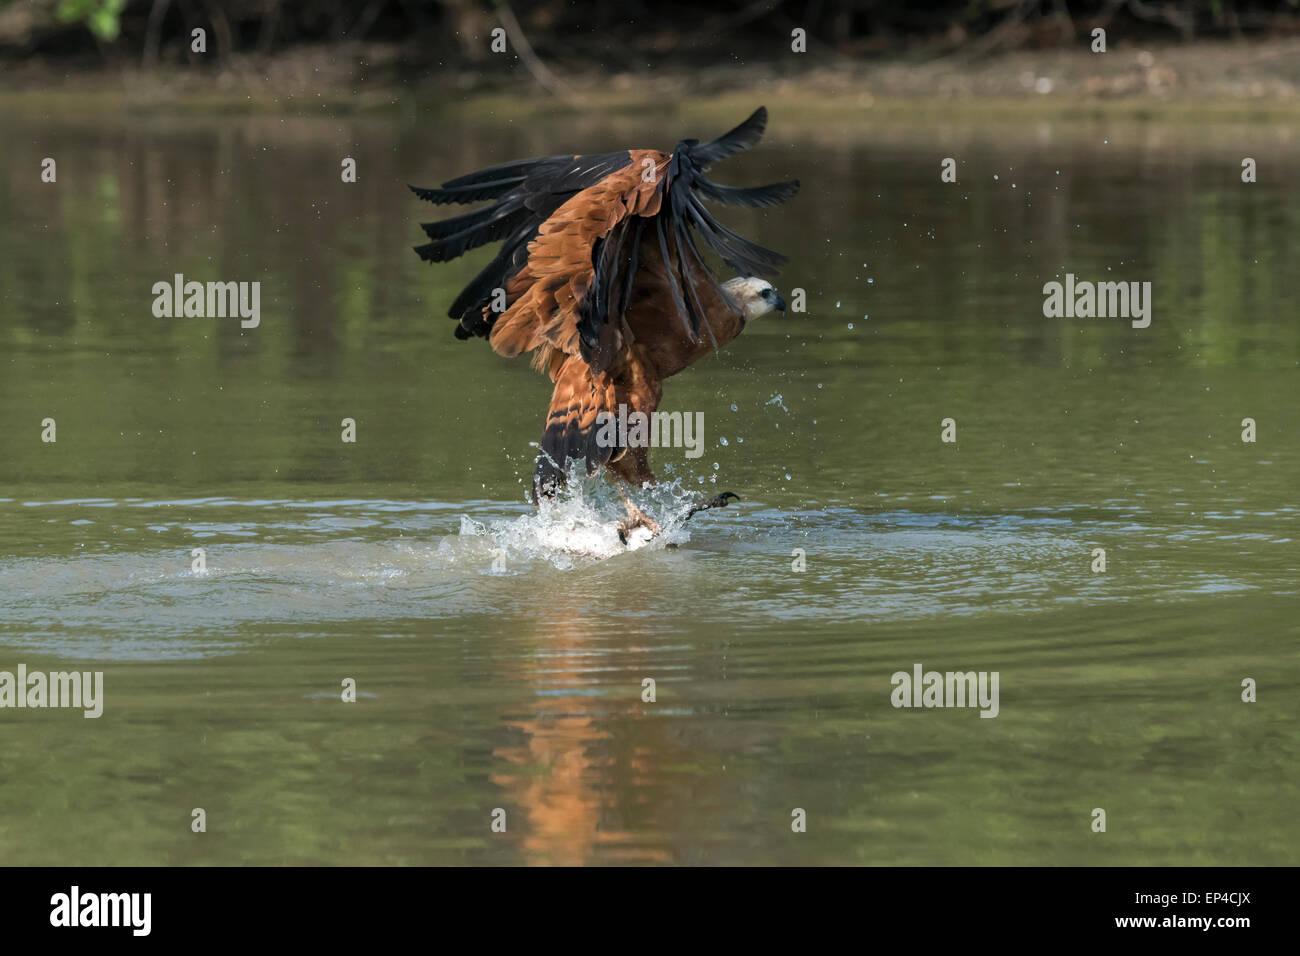 Black collared hawk (Busarellus nigricollis) grabbing a fish, Pixaim River, Pantanal, Brazil - Stock Image